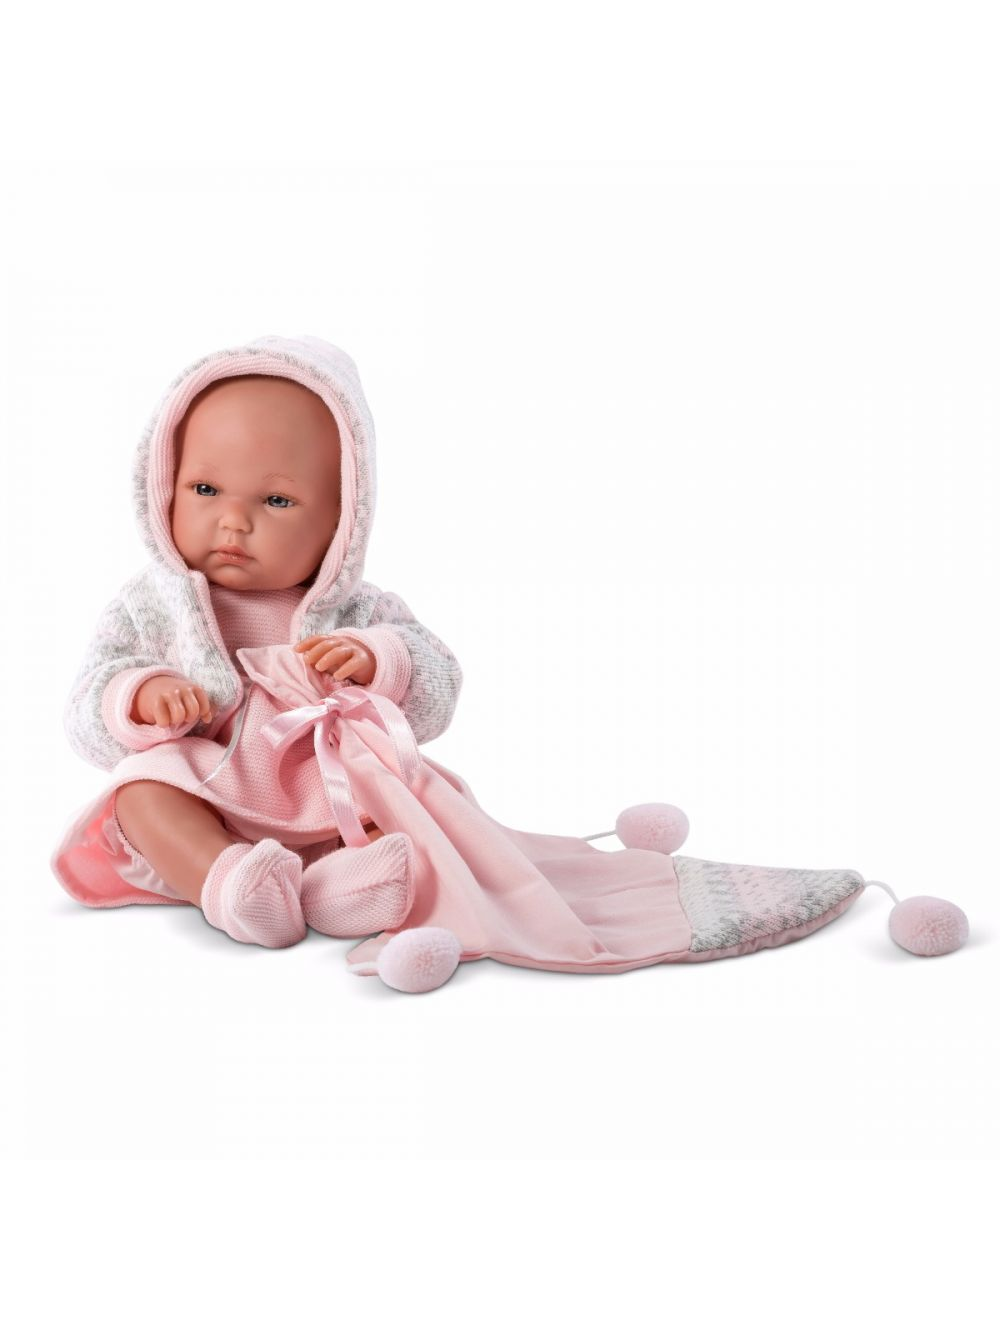 LLORENS Lalka Bimba w różowej sukience 35 cm